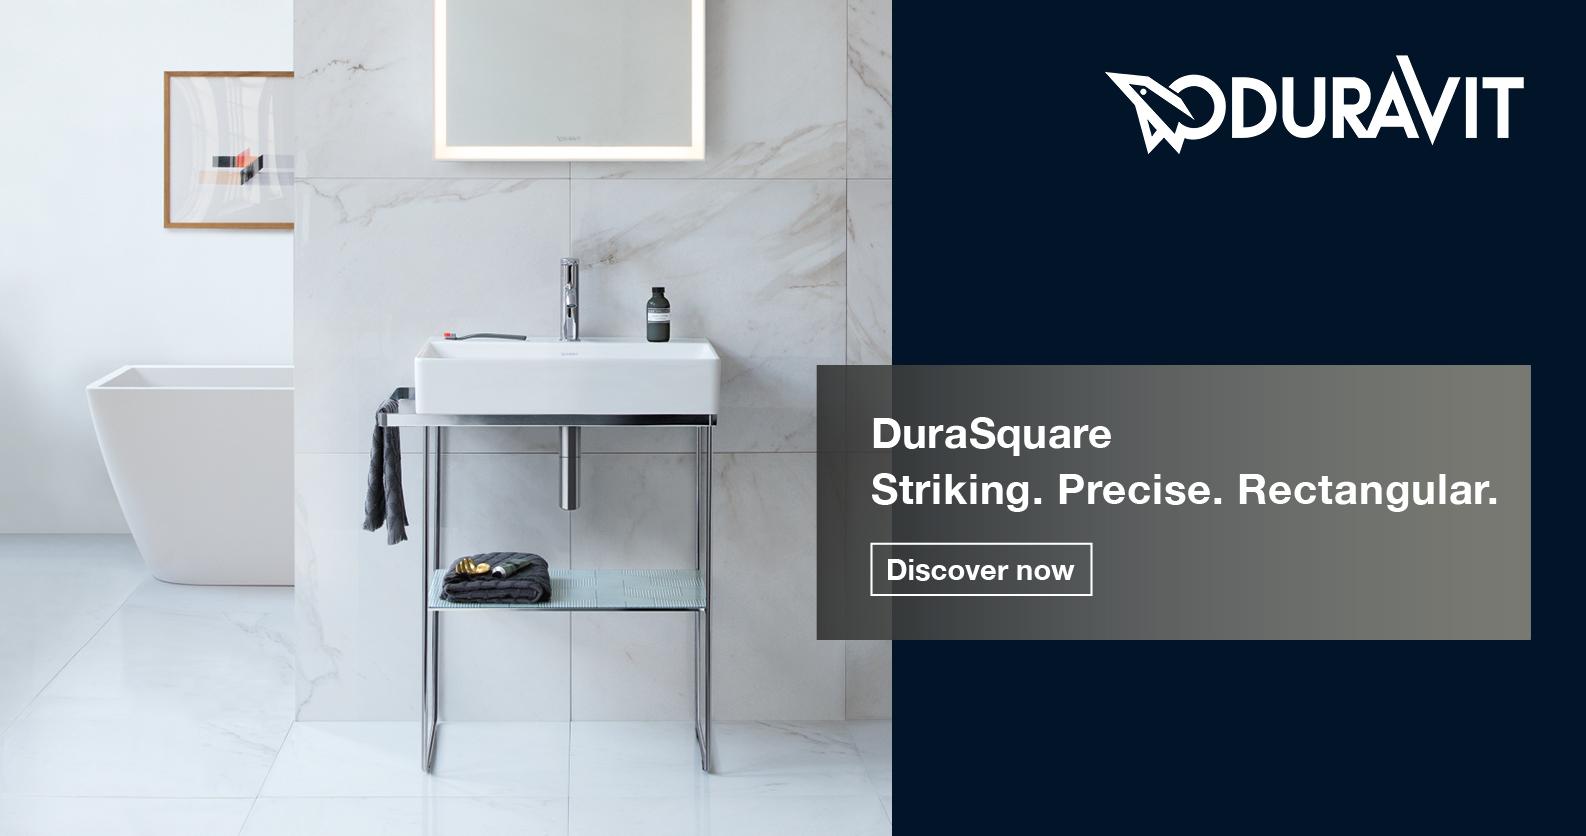 Duravit DuraSquare at xTWOstore